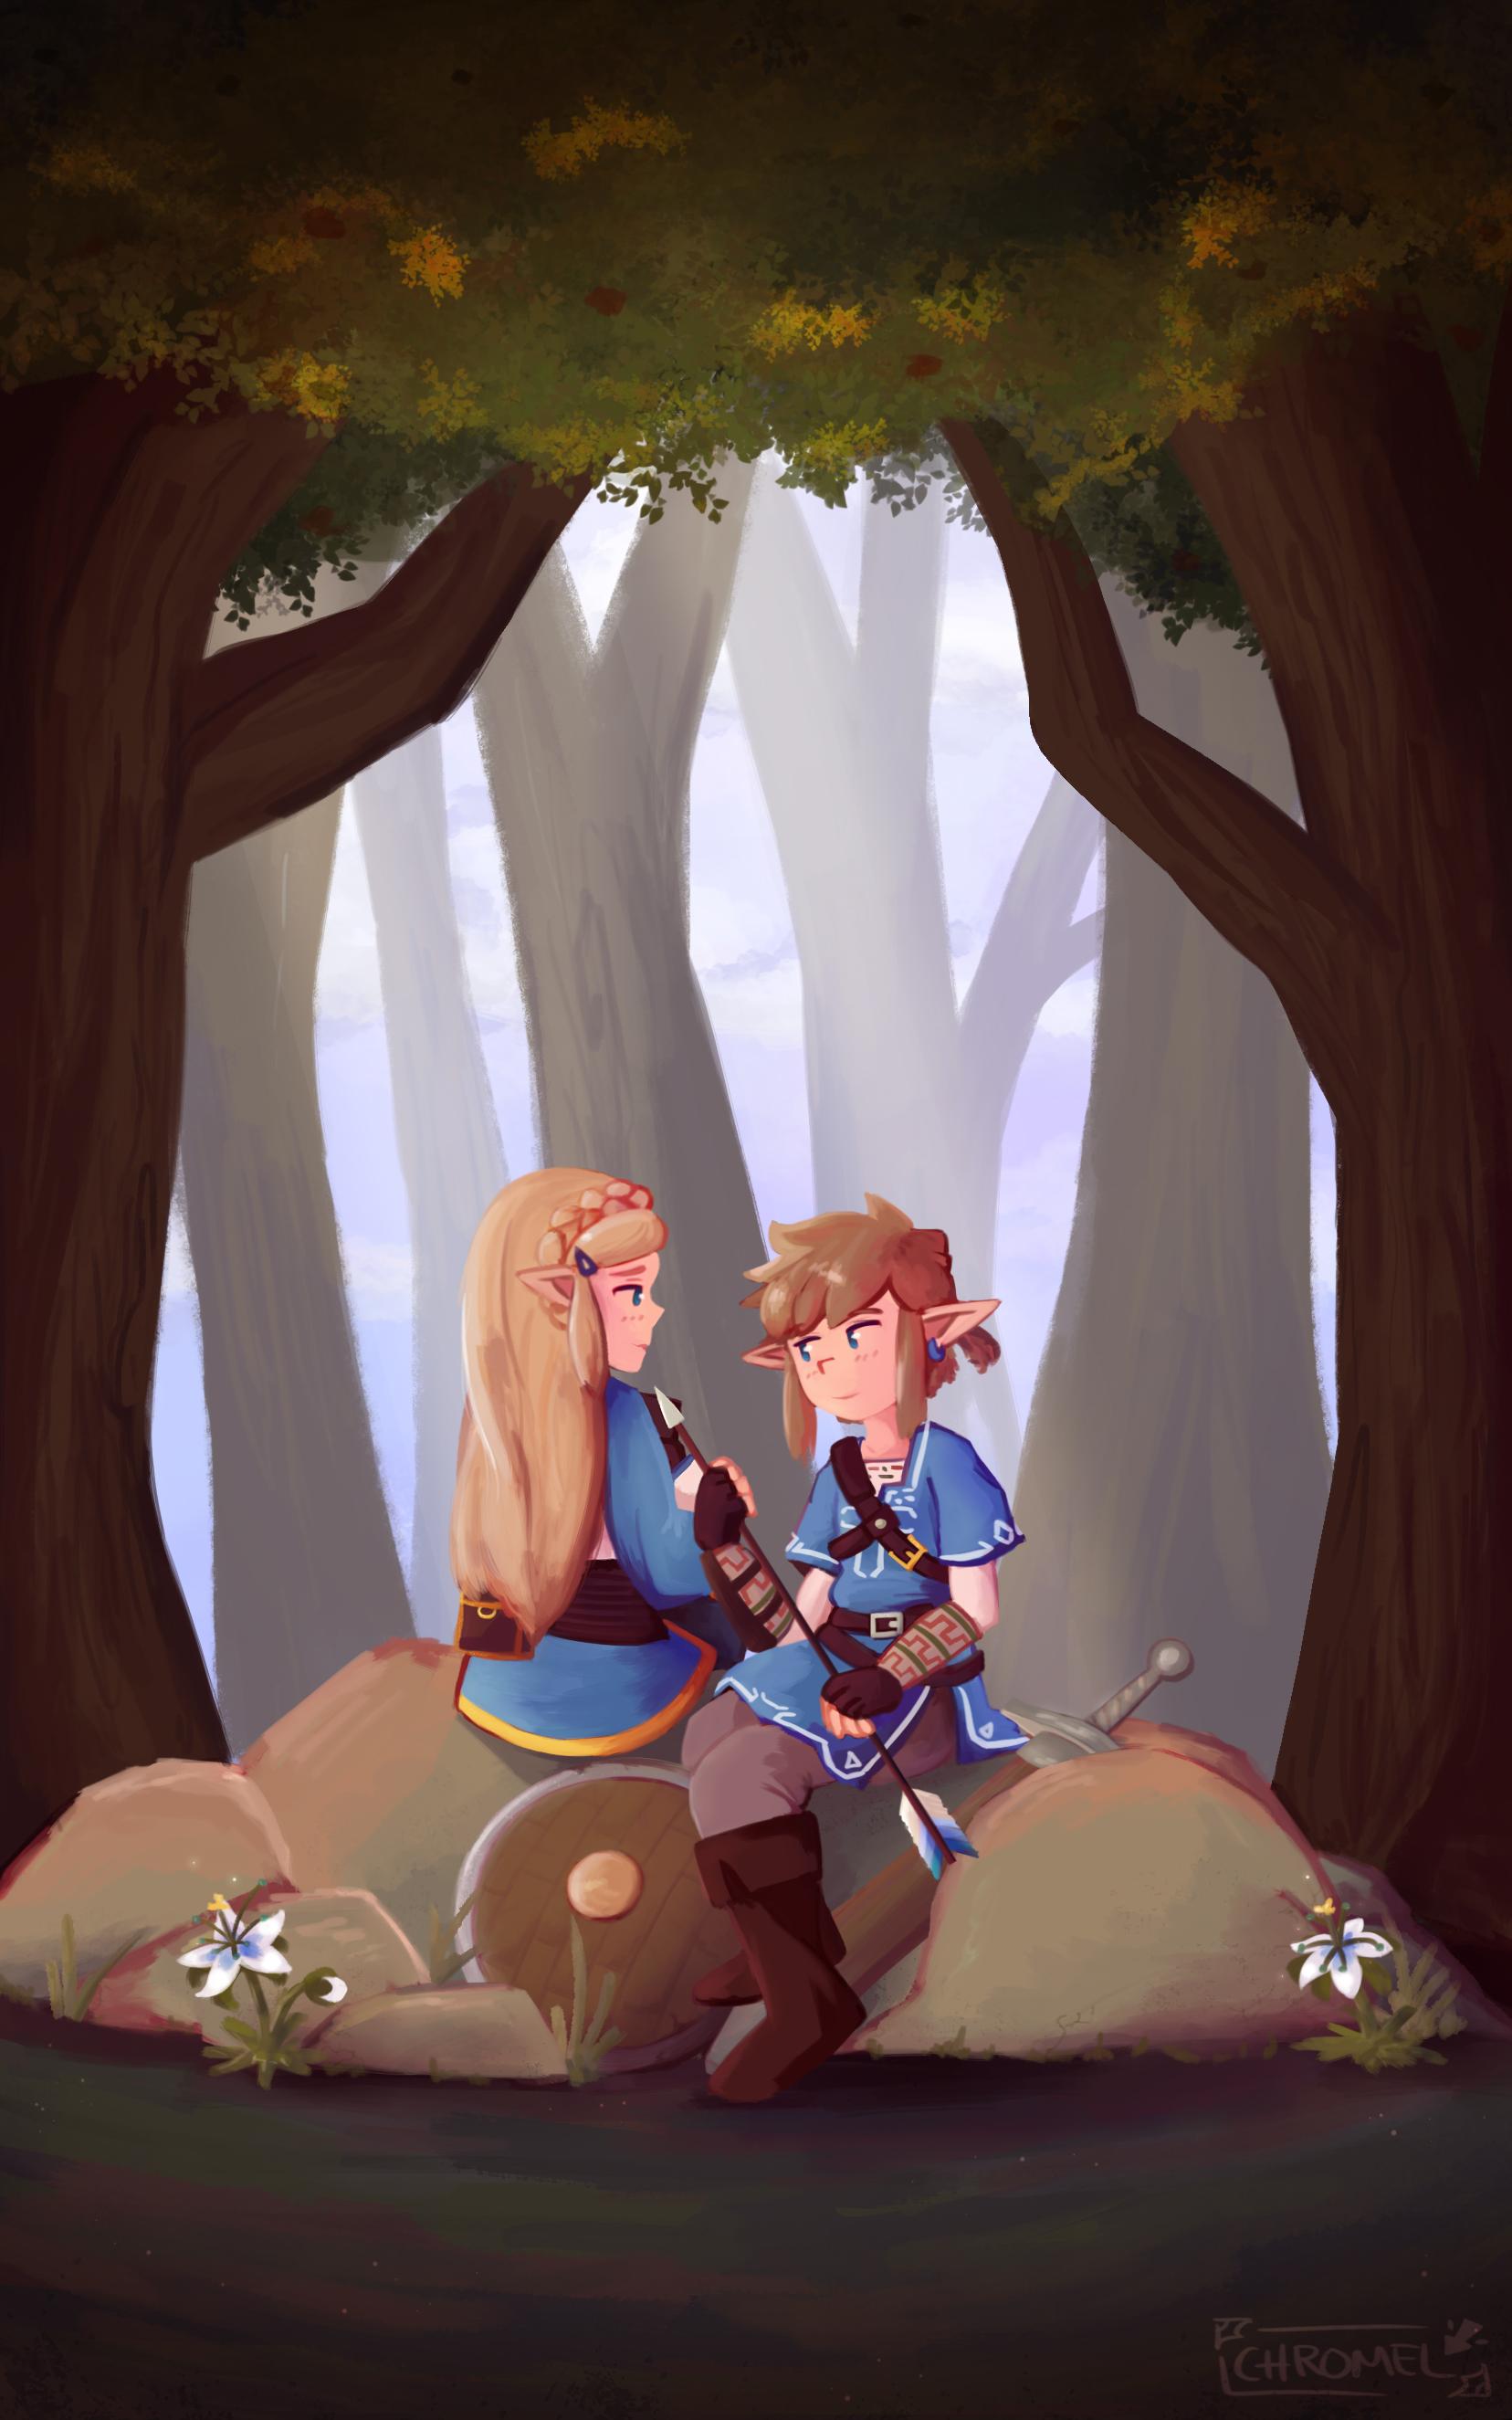 A New Adventure (Zelda: BotW) by Chromel